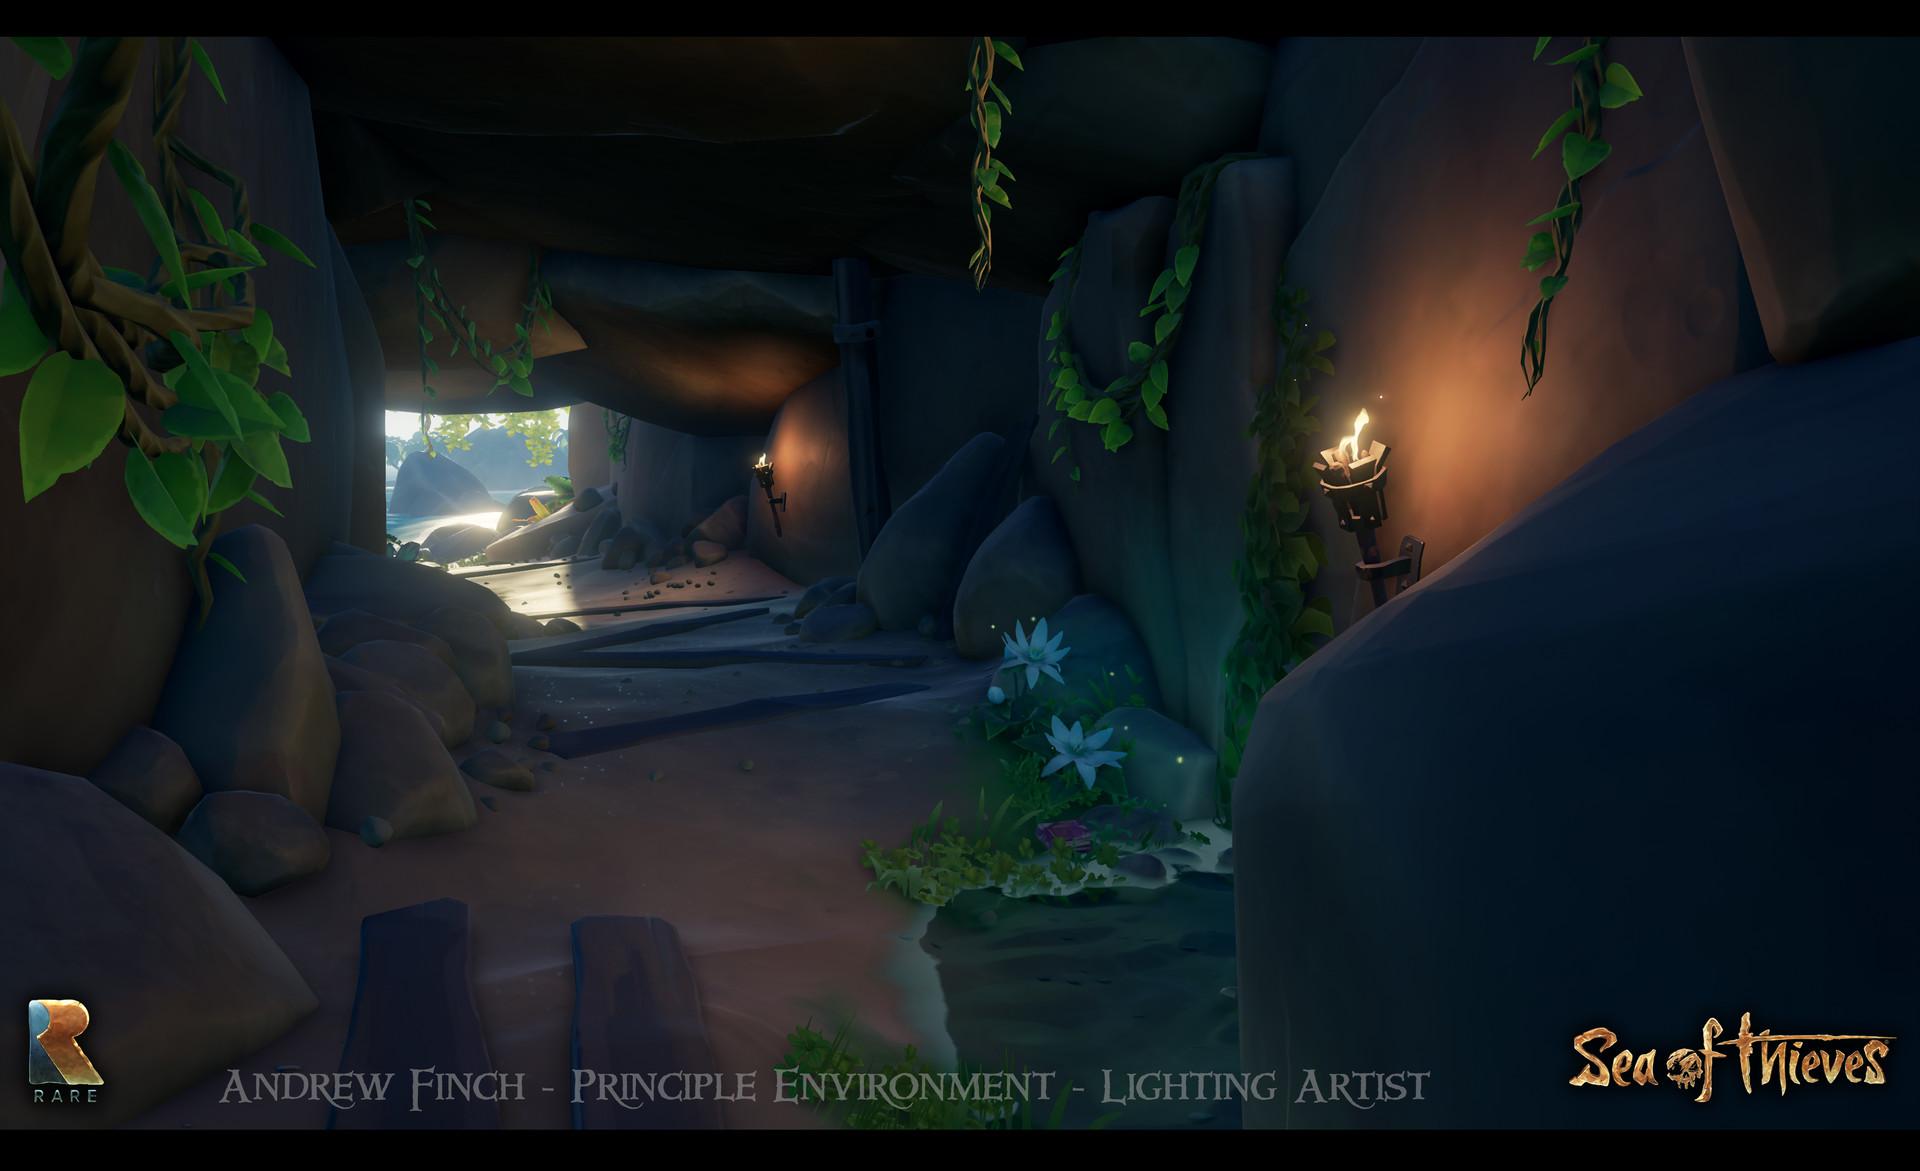 Andrew finch island lighting 18